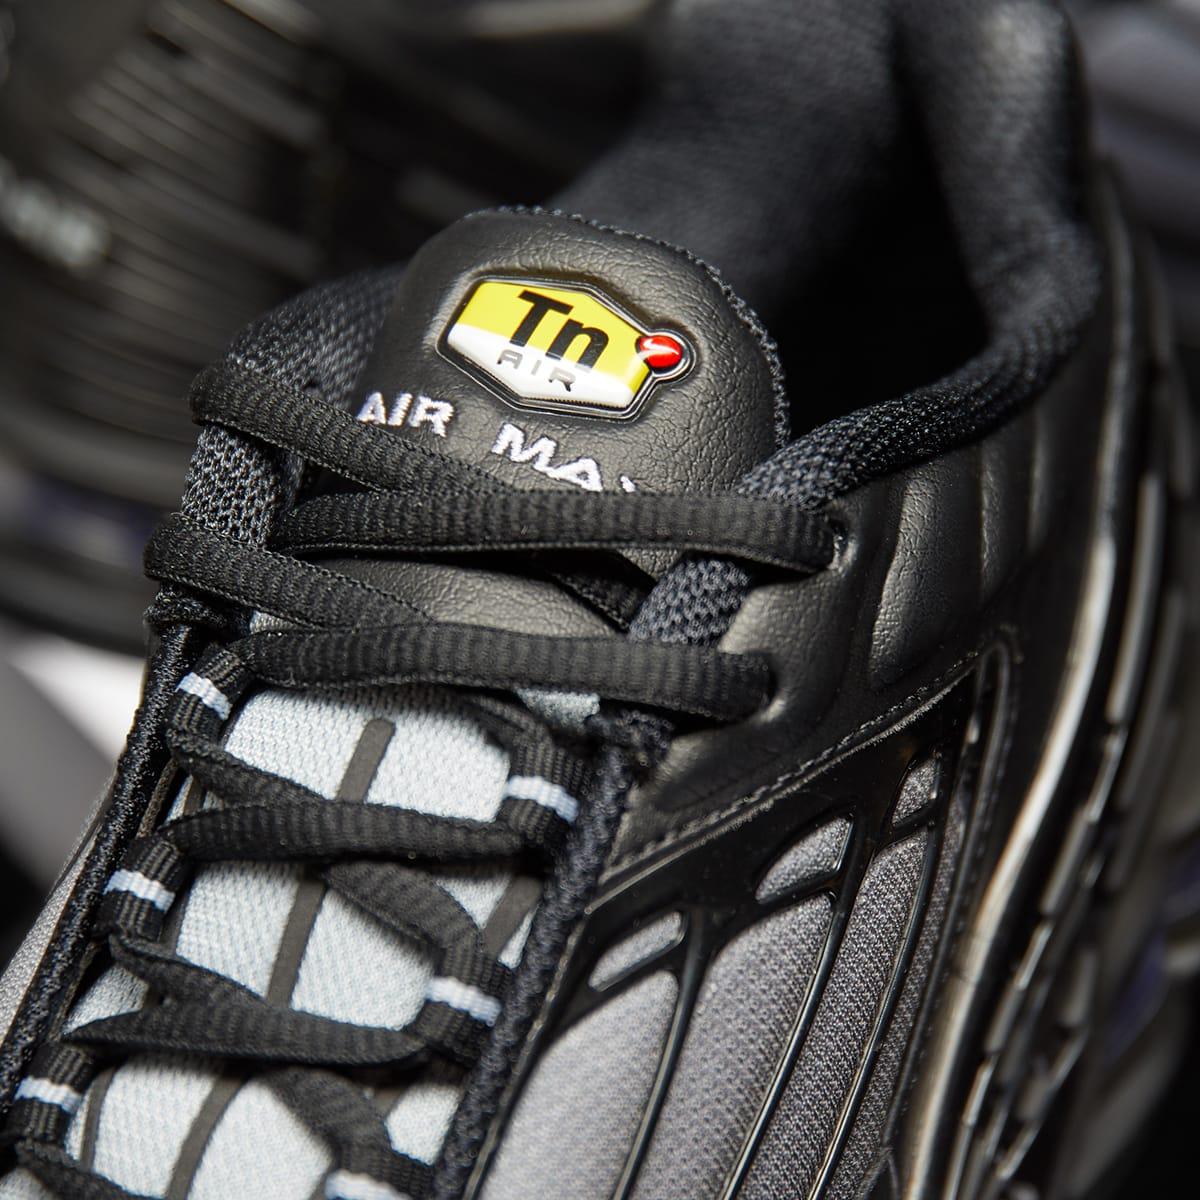 Nike Air Max Plus III - CJ9684-002